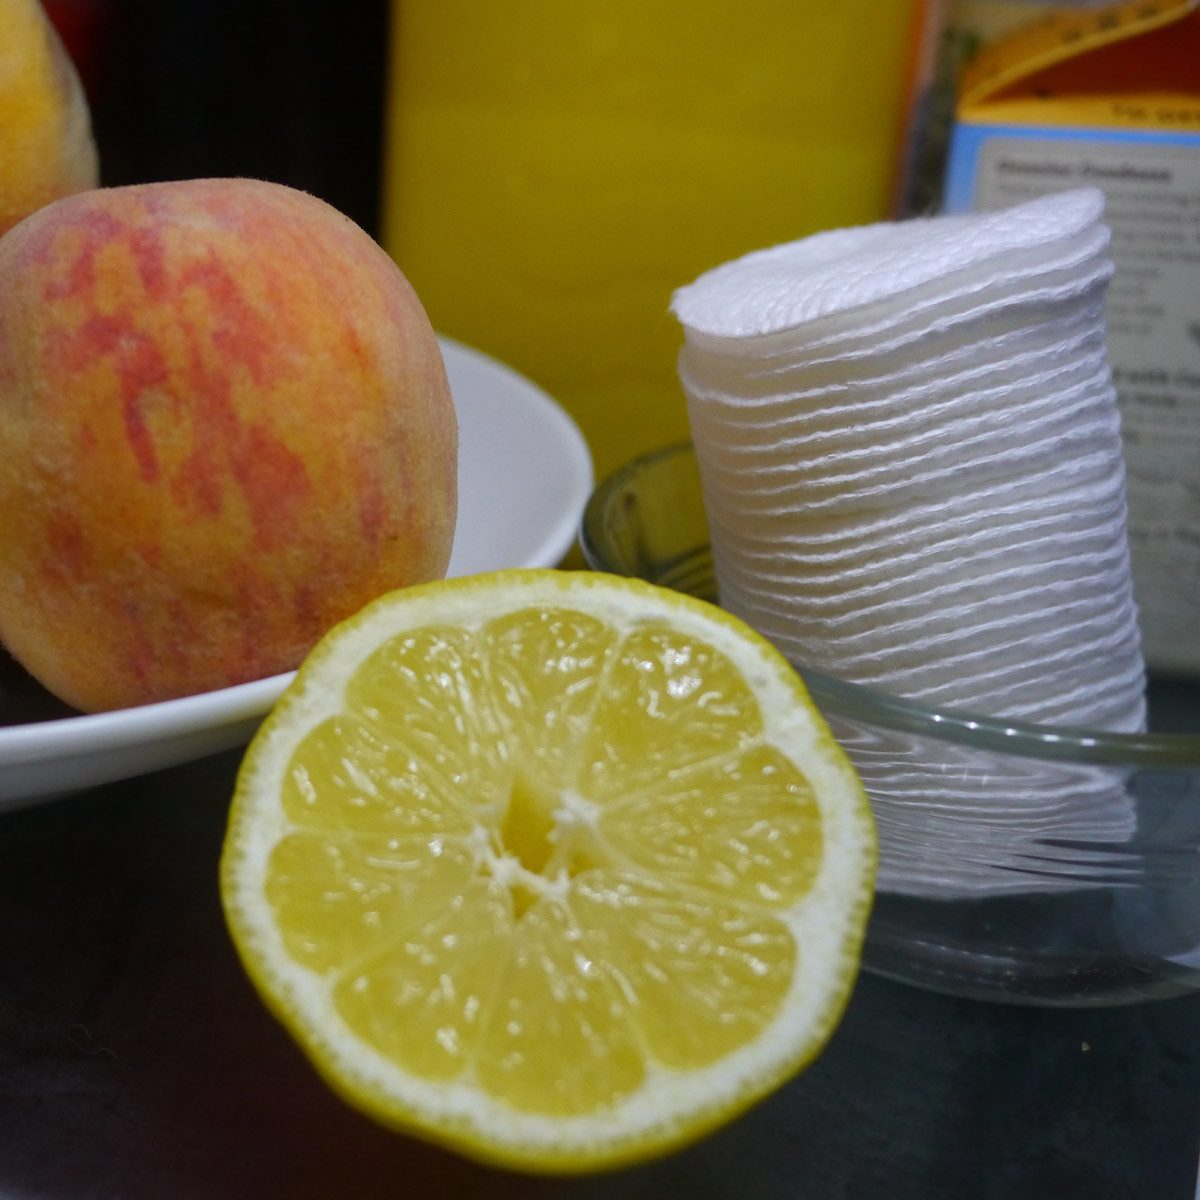 Remove refrigerator odors